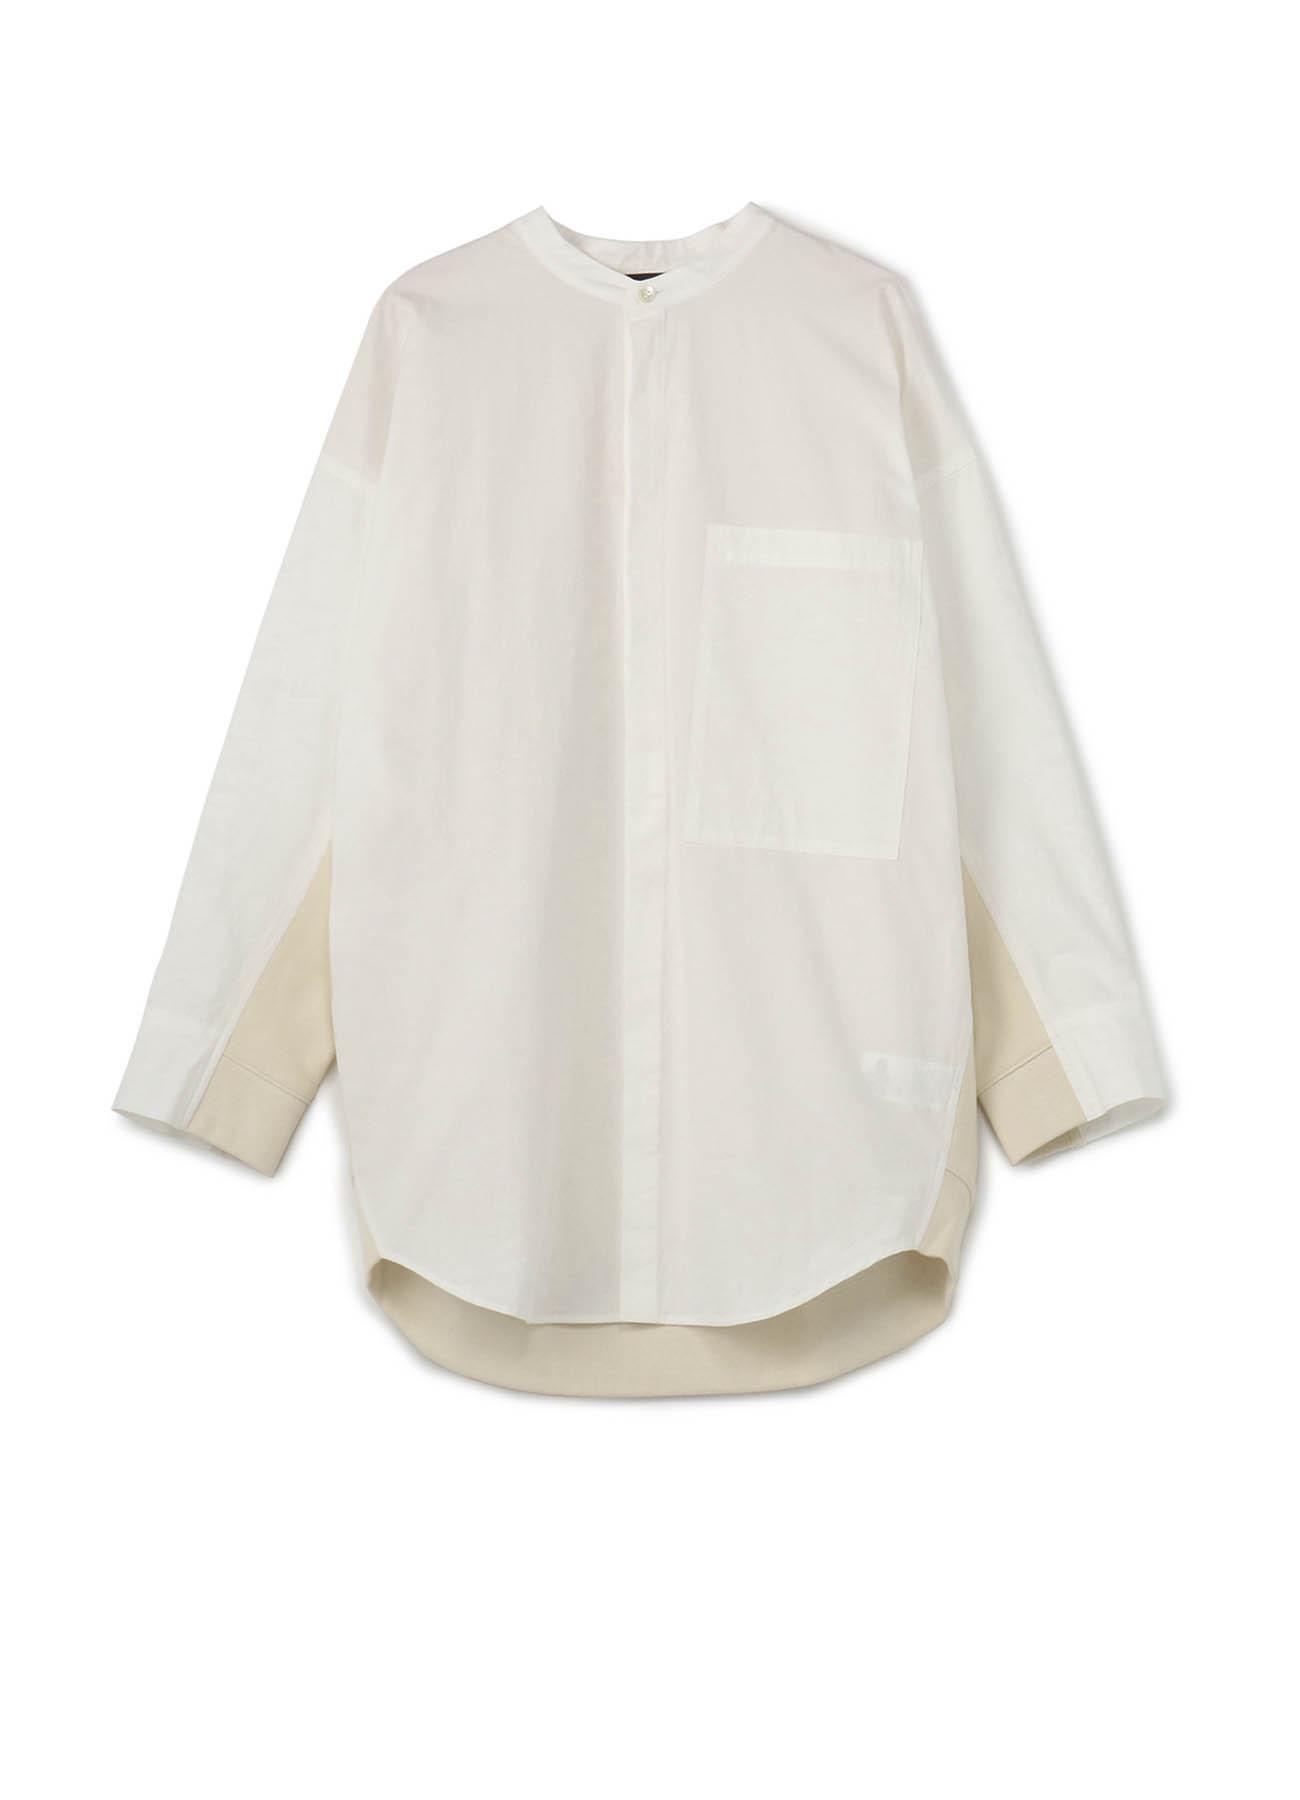 RISMATbyY's 拼接无领宽松衬衫